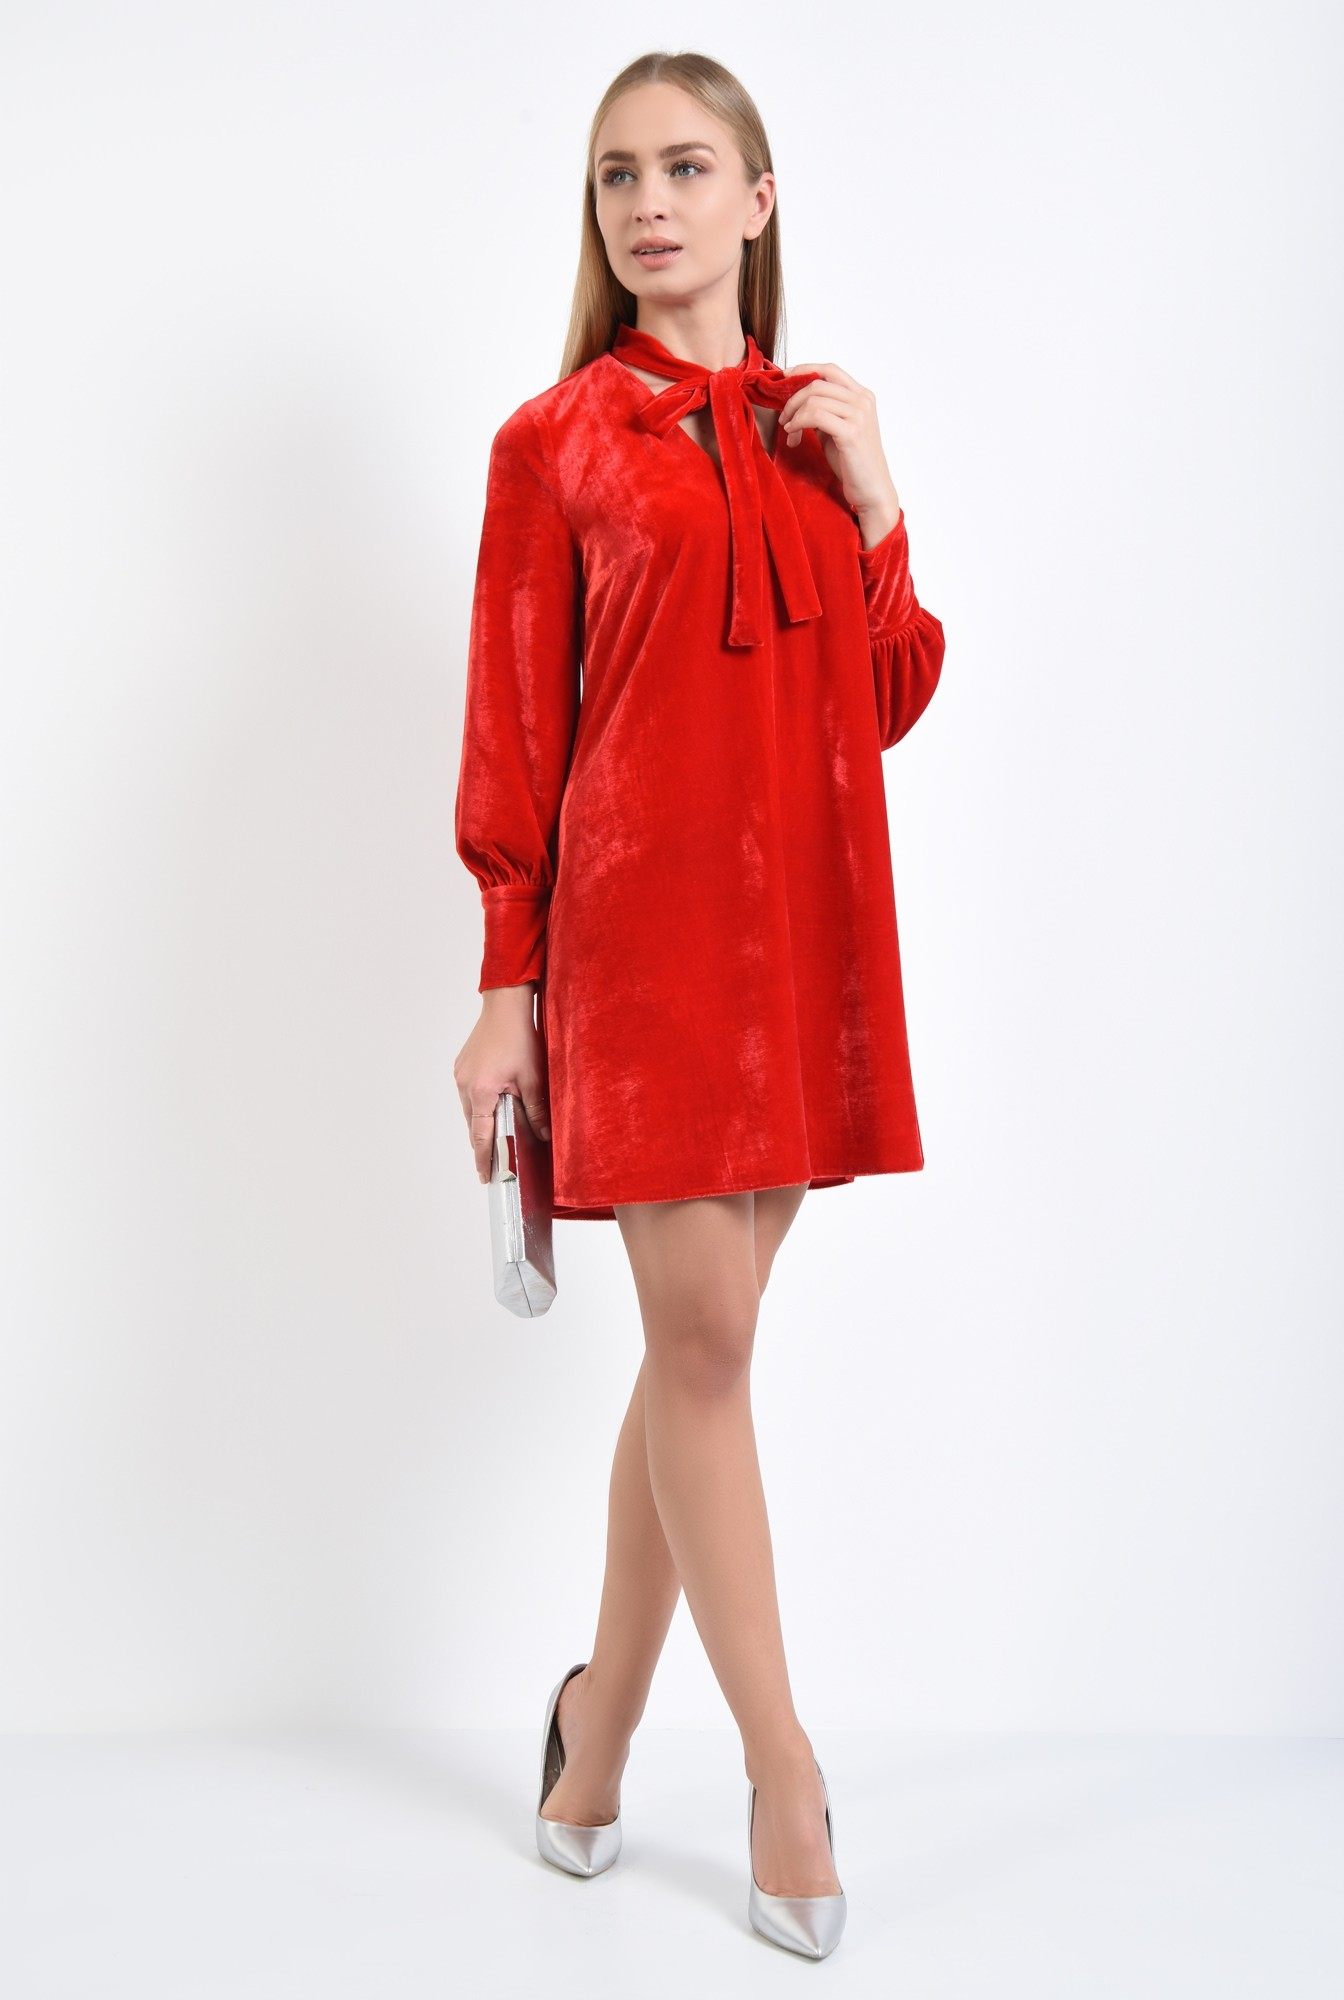 3 - rochie rosie, mini, croi larg, maneci bufante, decolteu anchior